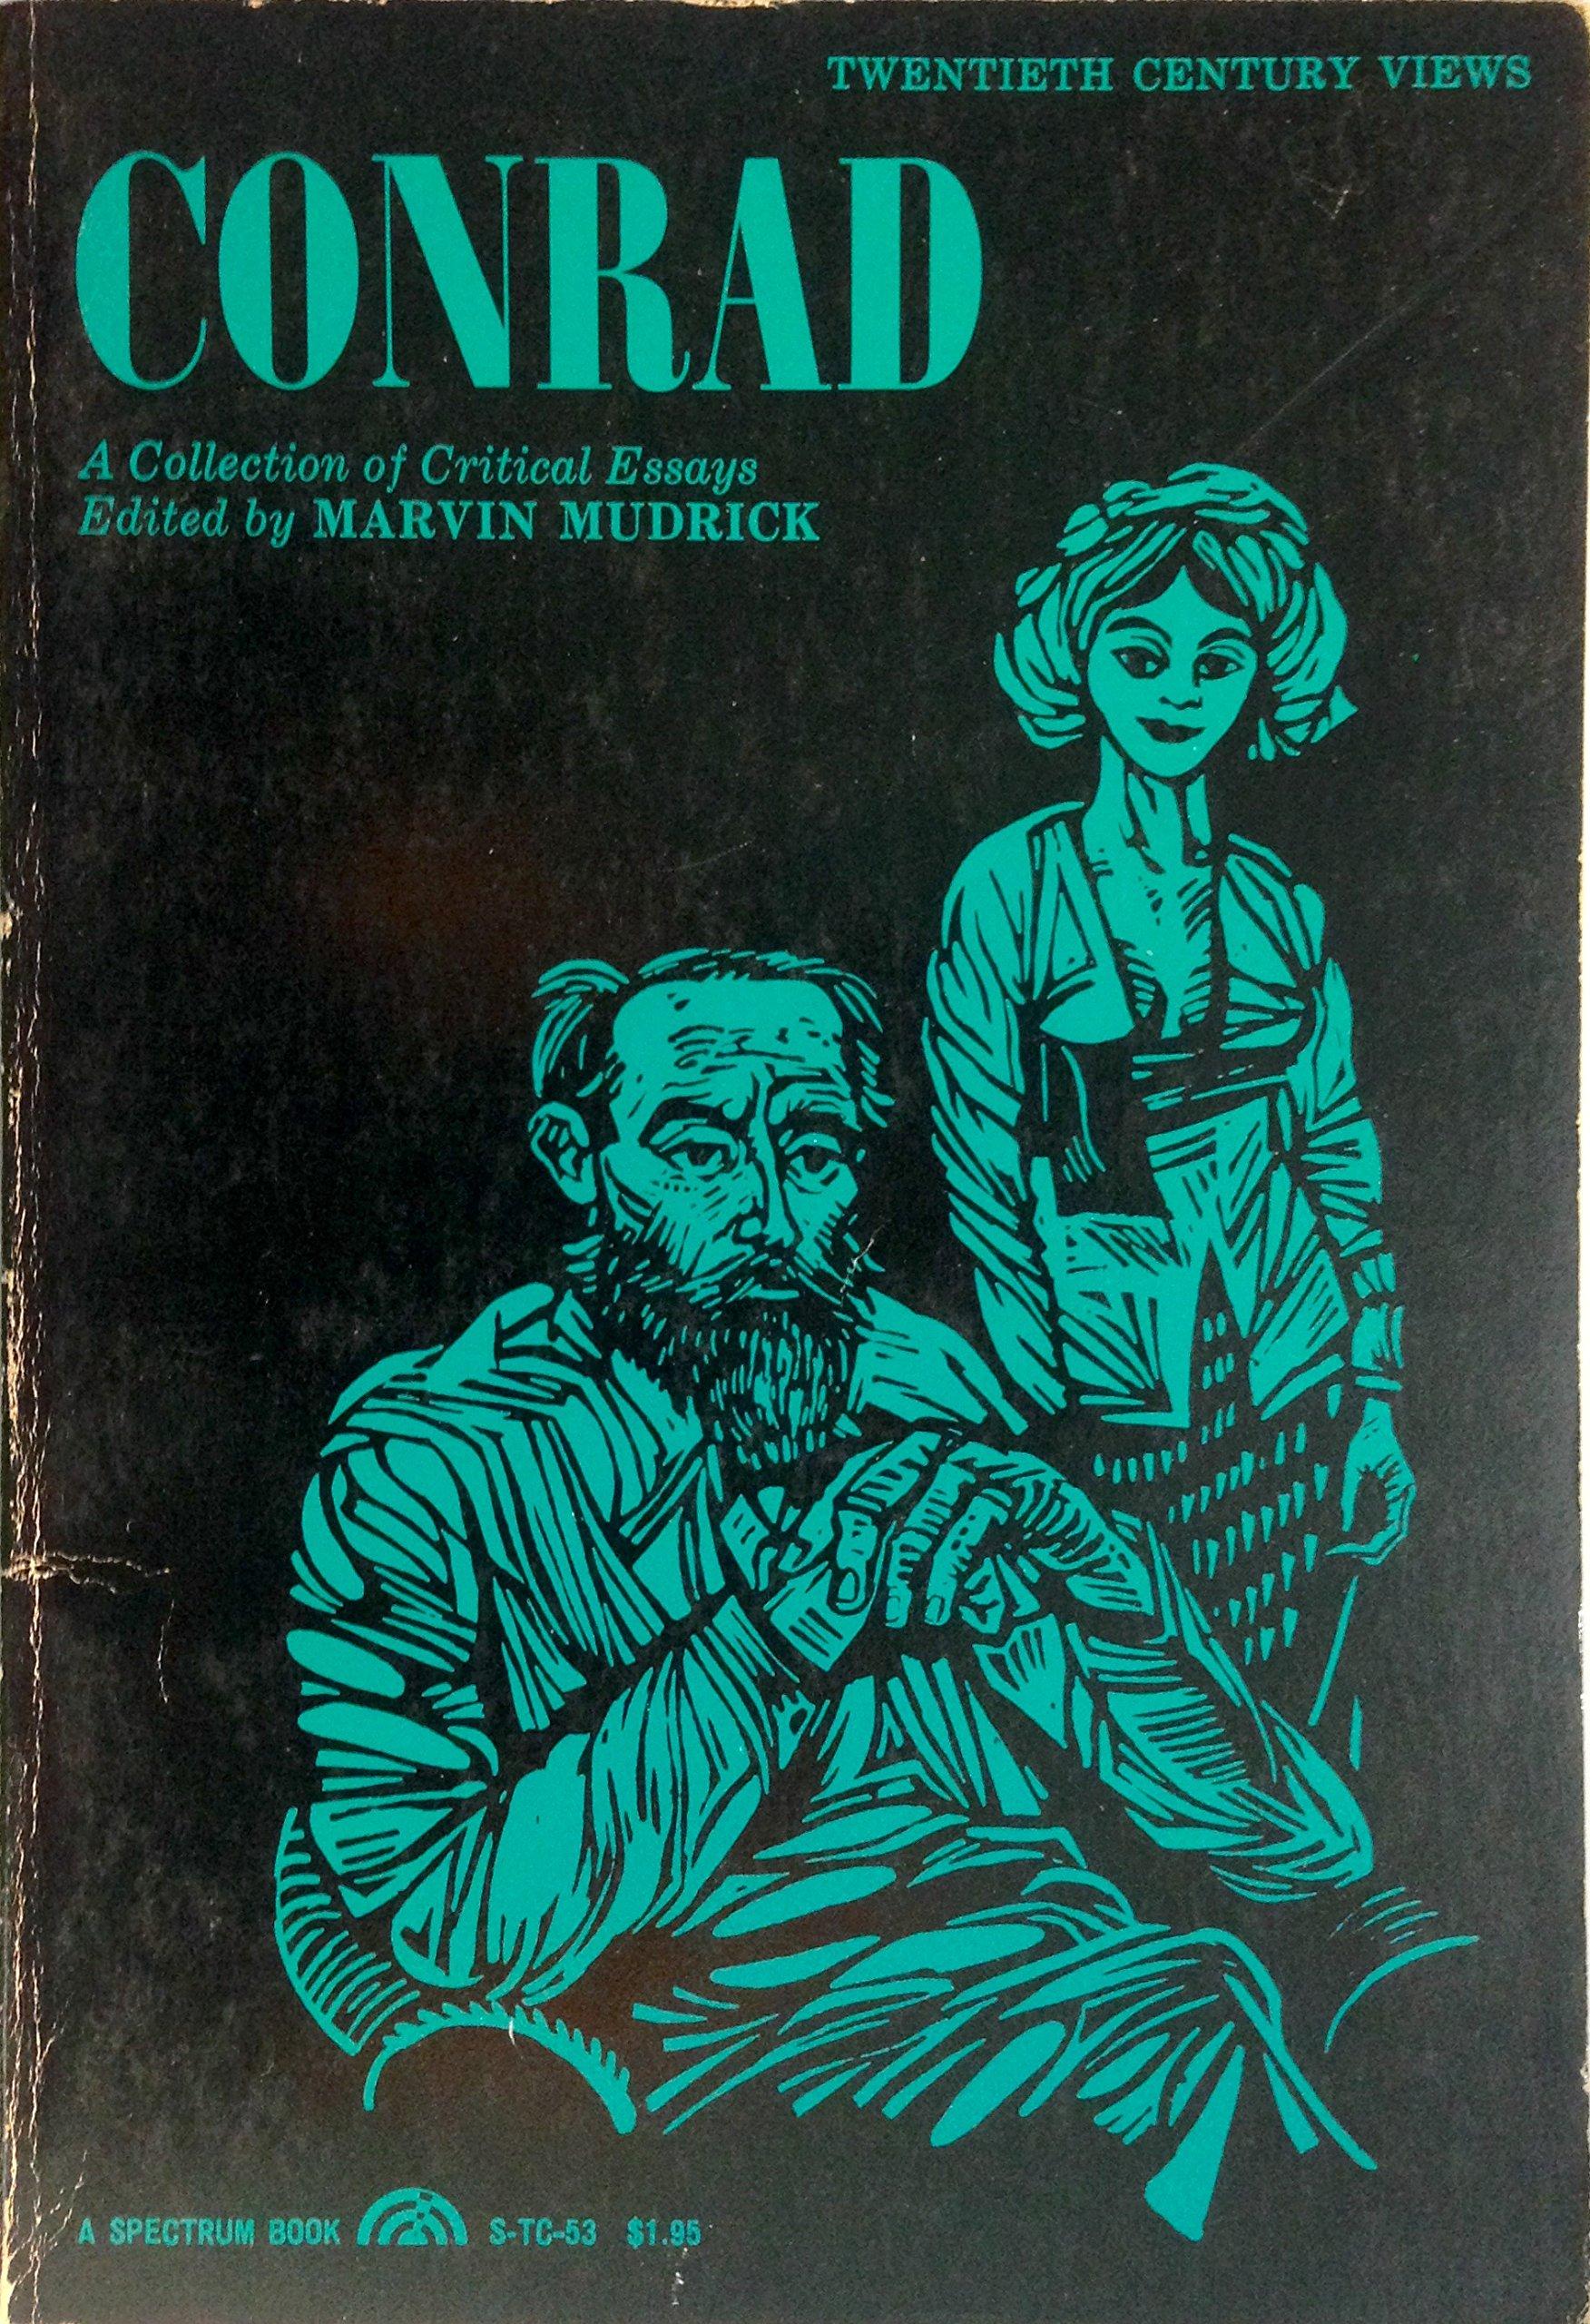 Best novel of the twentieth century essay